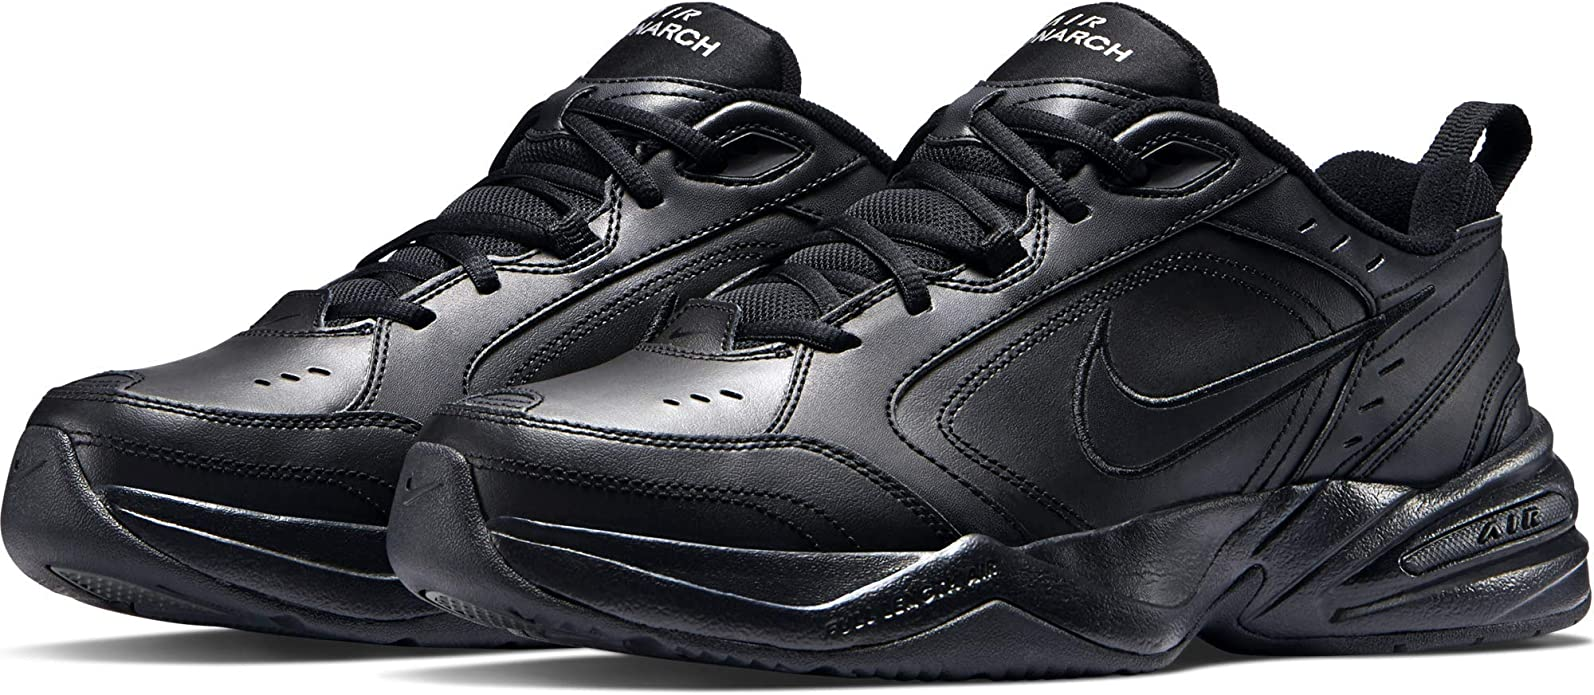 chaussure air nike sneakers athletic